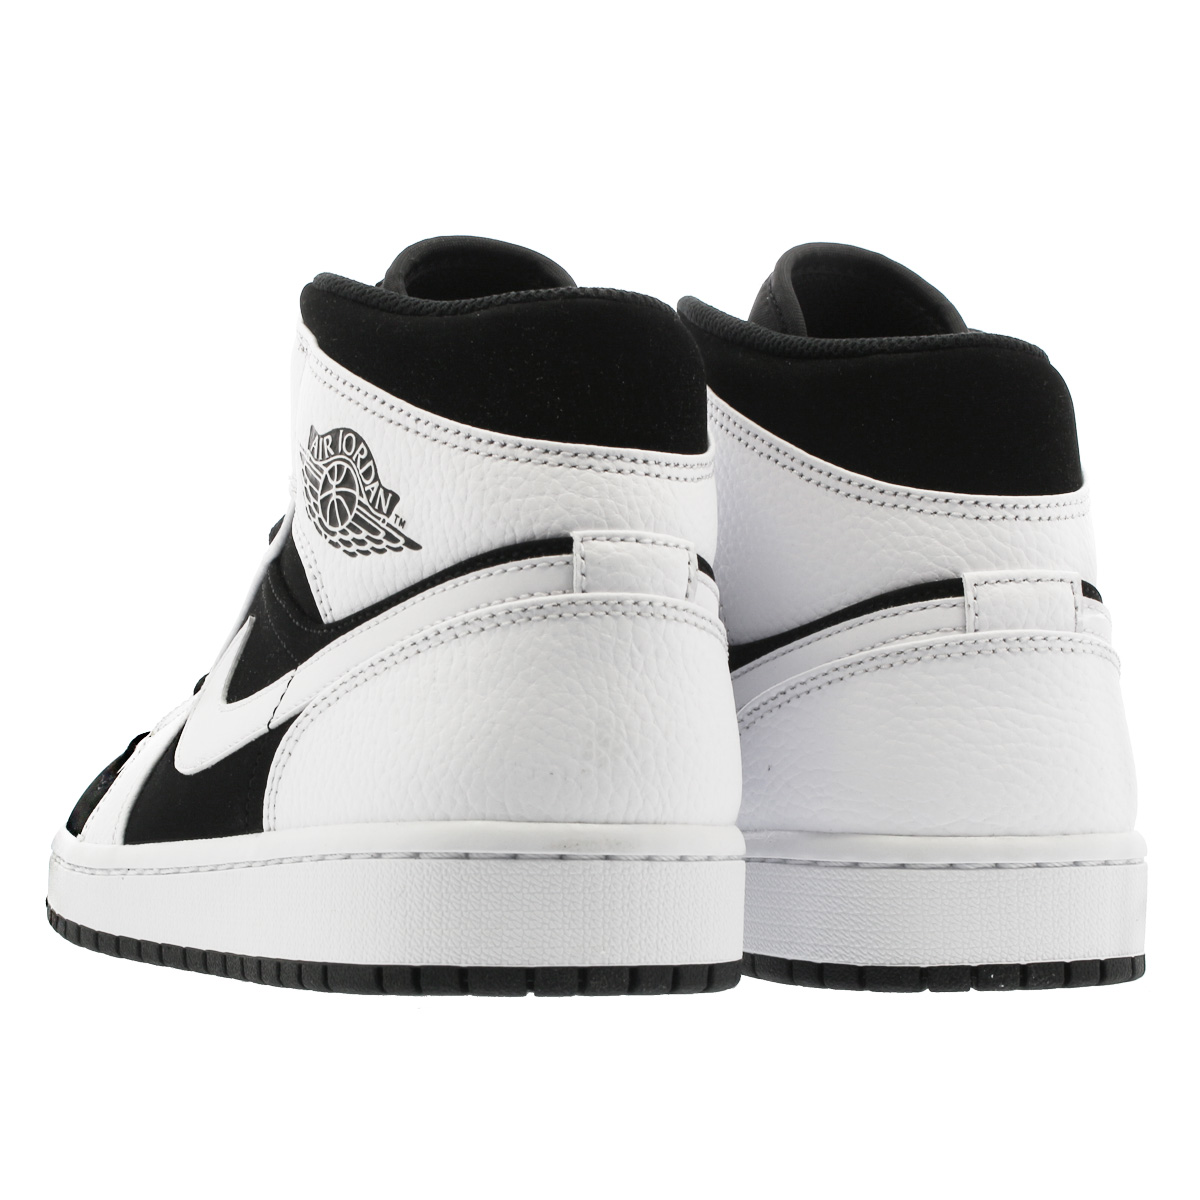 los angeles 255d8 a0570 ... NIKE AIR JORDAN 1 MID Nike Air Jordan 1 mid WHITE BLACK 554,724-113 ...